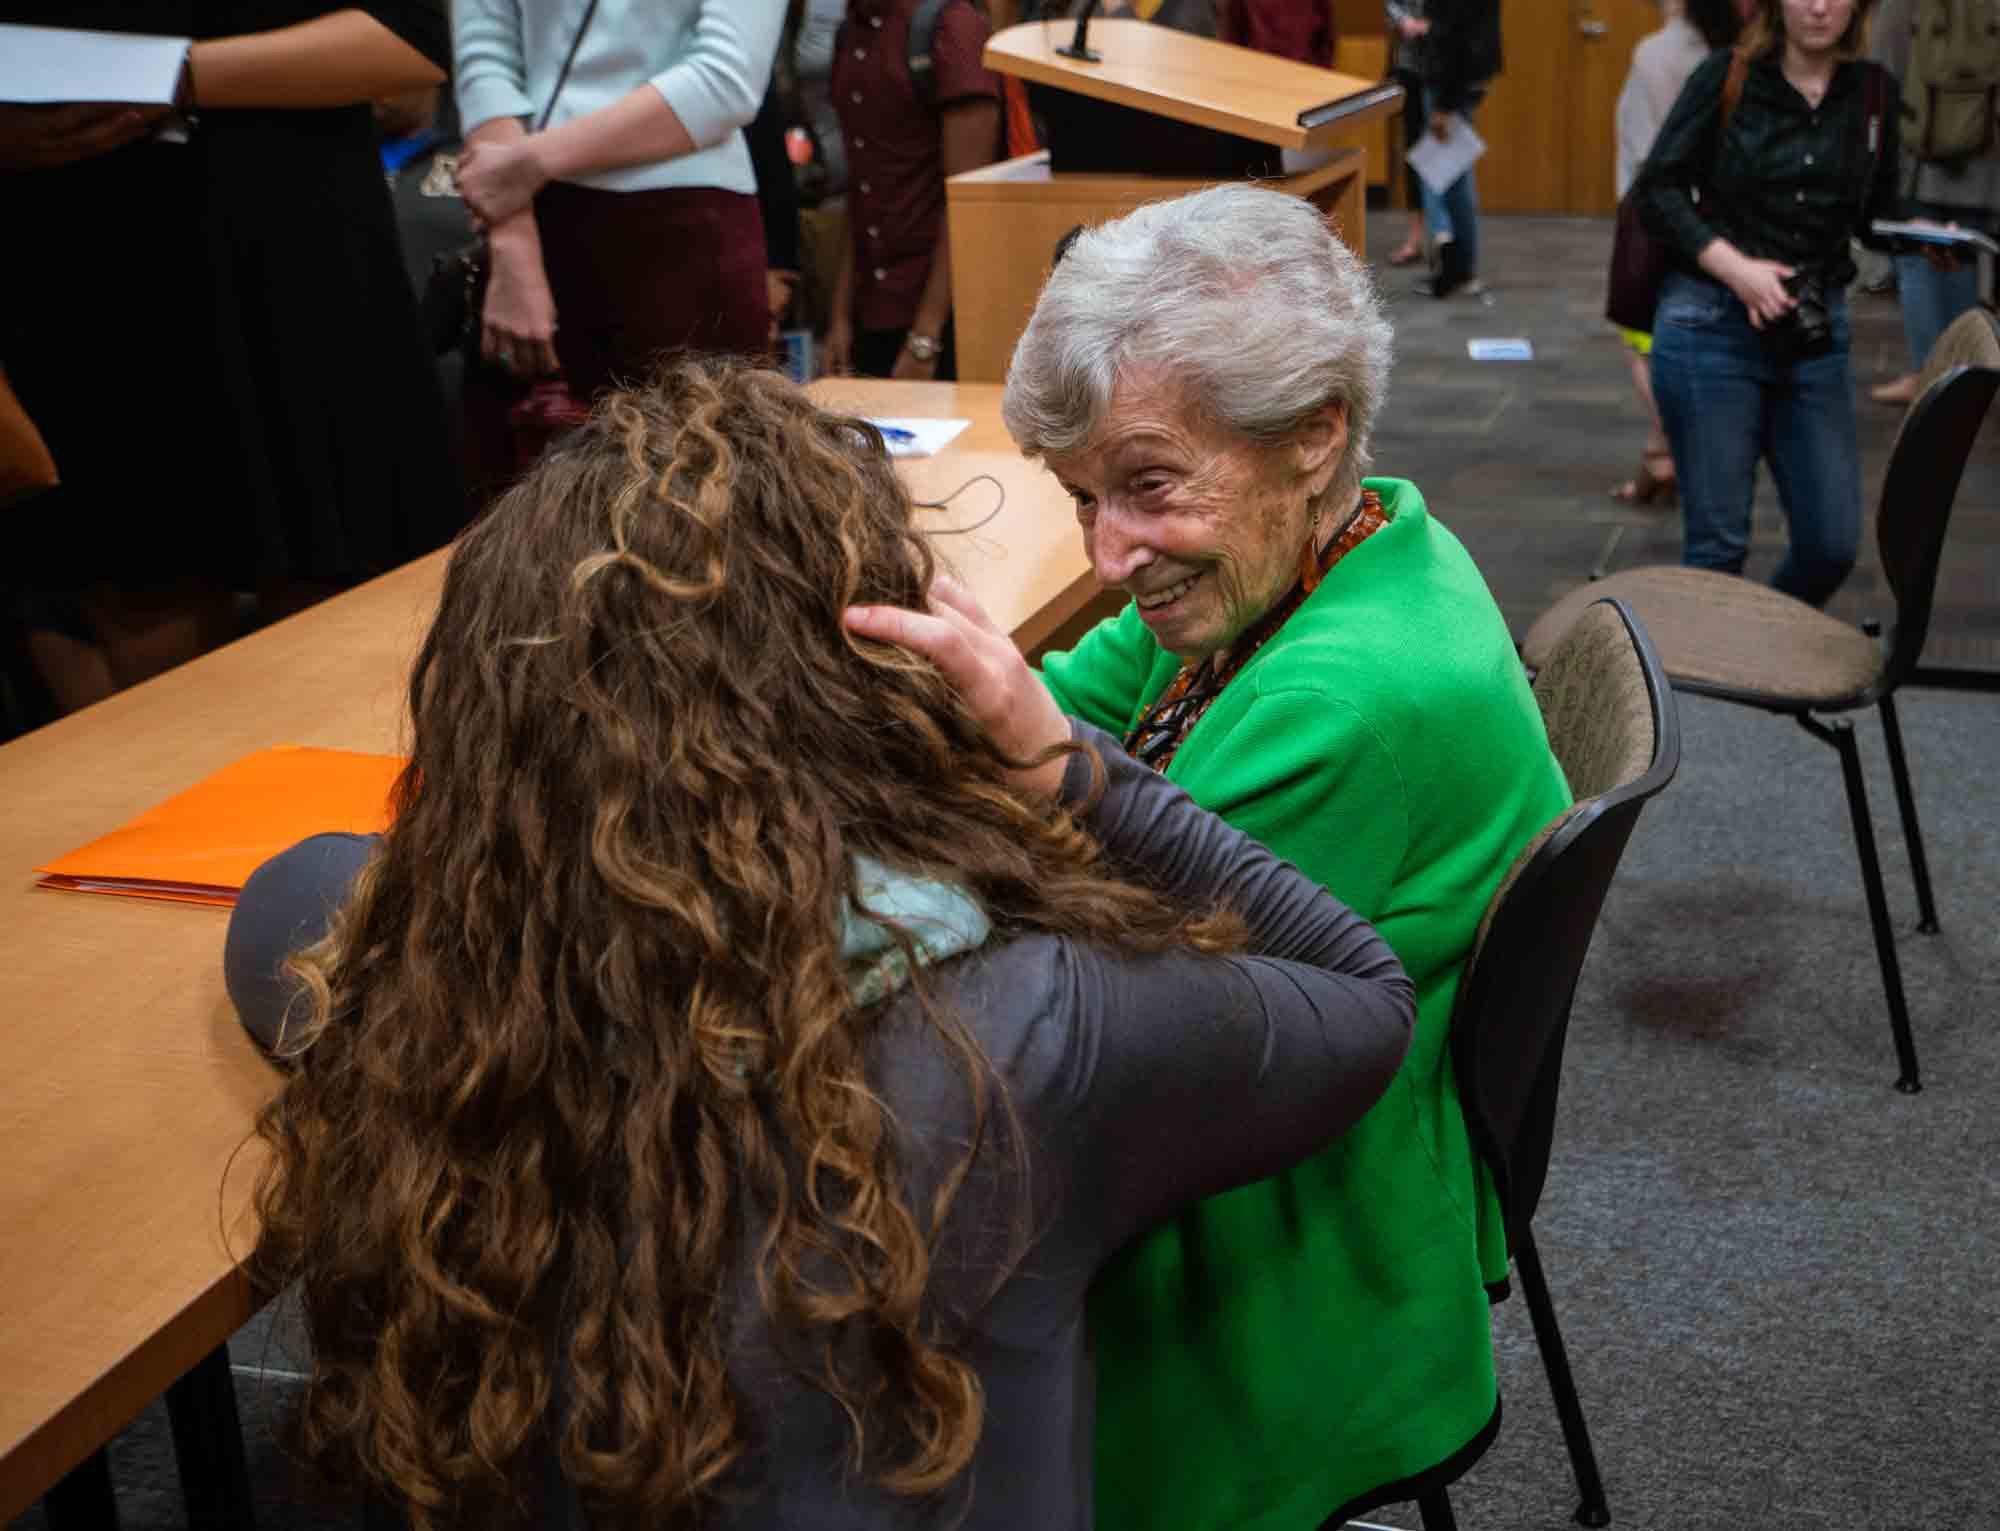 Prisoner No. 34042: Susan Cernyak-Spatz survives Holocaust with realism, not faith